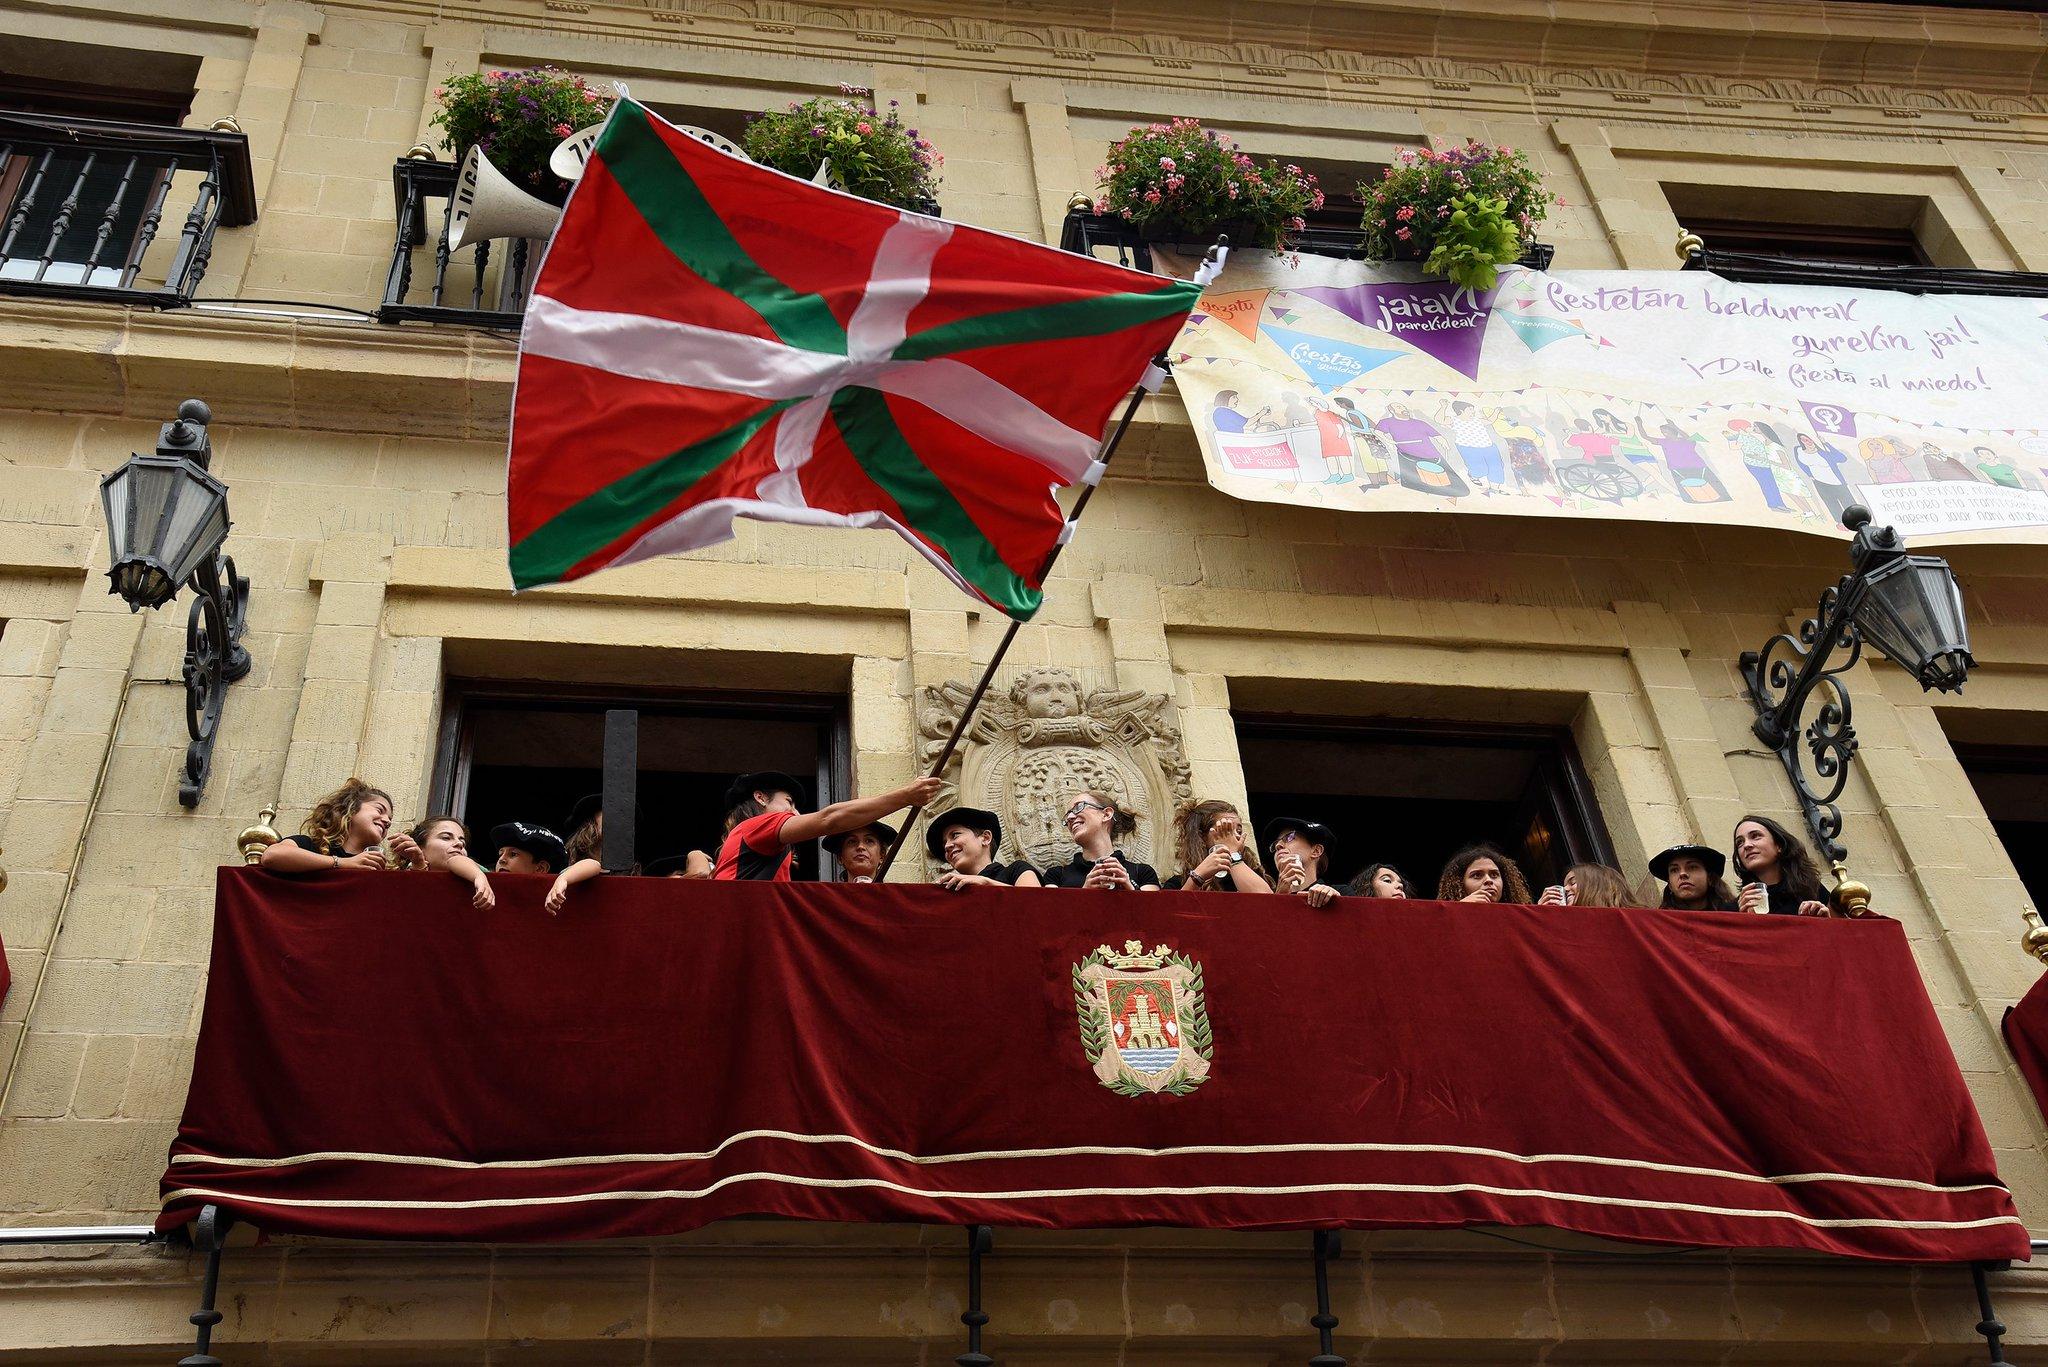 Las chicas de Hibaika campeonas de Euskadi https://t.co/DRUjFej3e8 #Madalenak2017 https://t.co/fy6HQV88uc